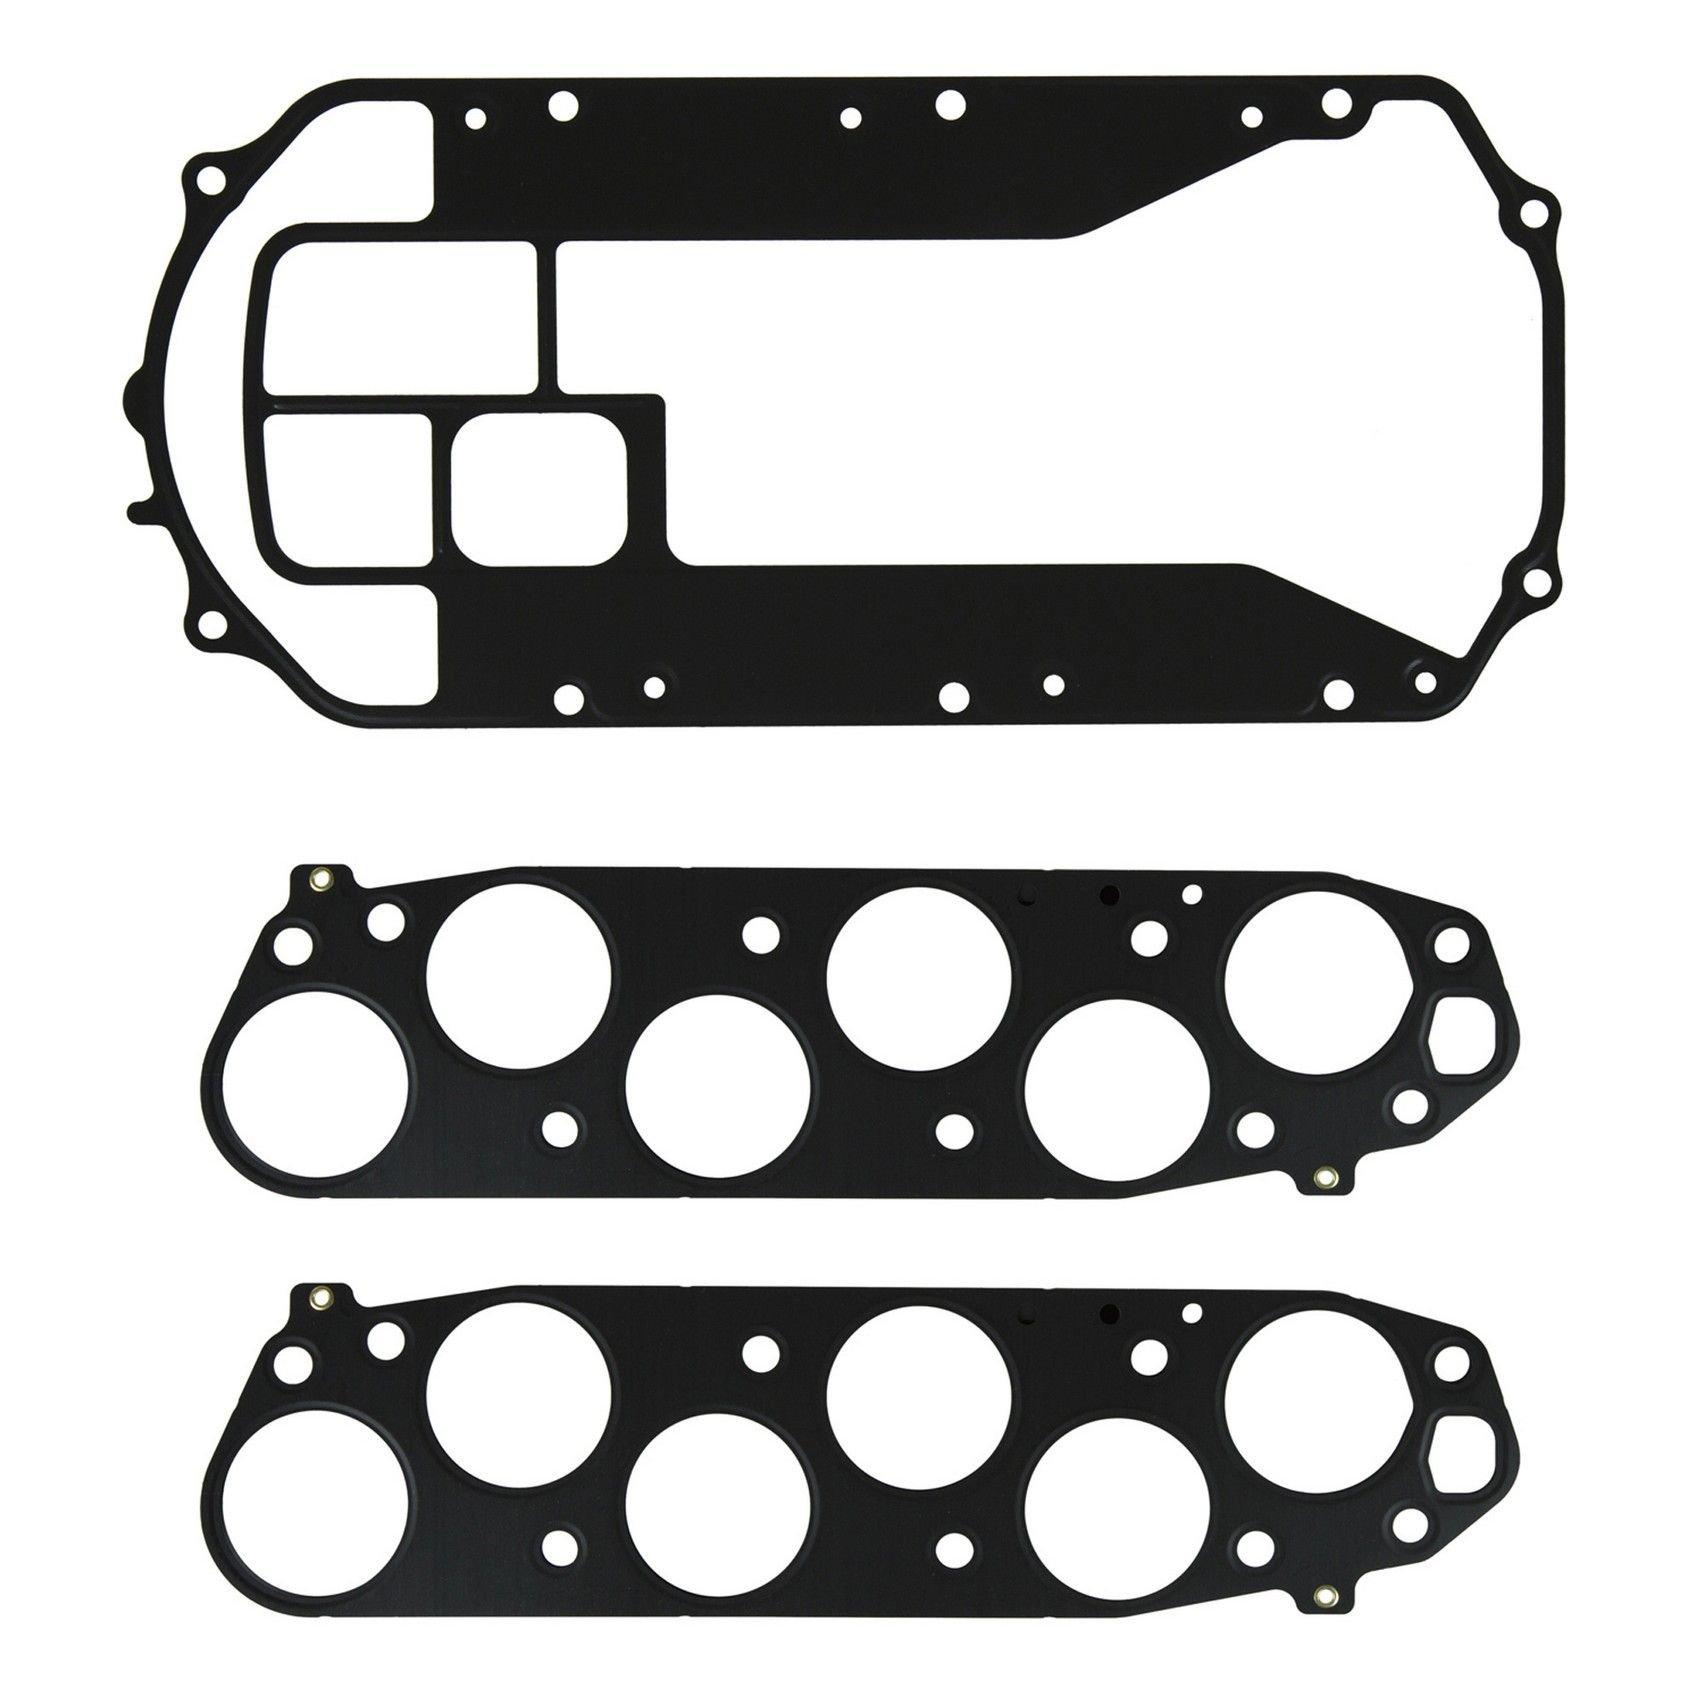 2000 Acura TL Fuel Injection Plenum Gasket Set 6 Cyl 3.2L (FelPro MS  96384-3) Plenum Gaskets Only Upper set .